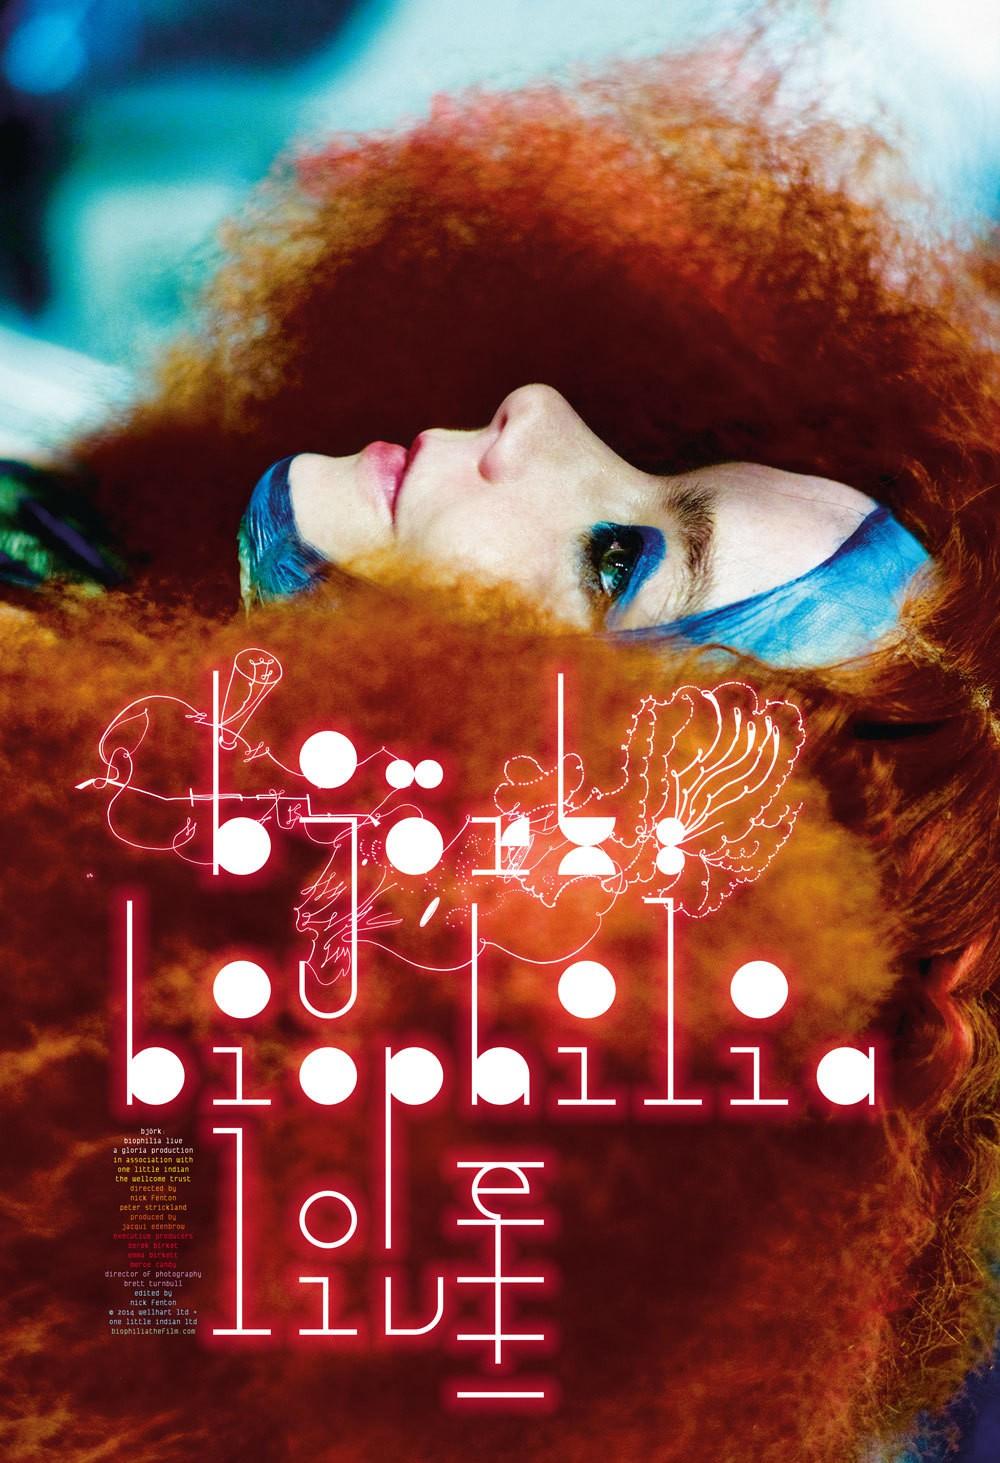 Poster for Bjork: Biophilia Live